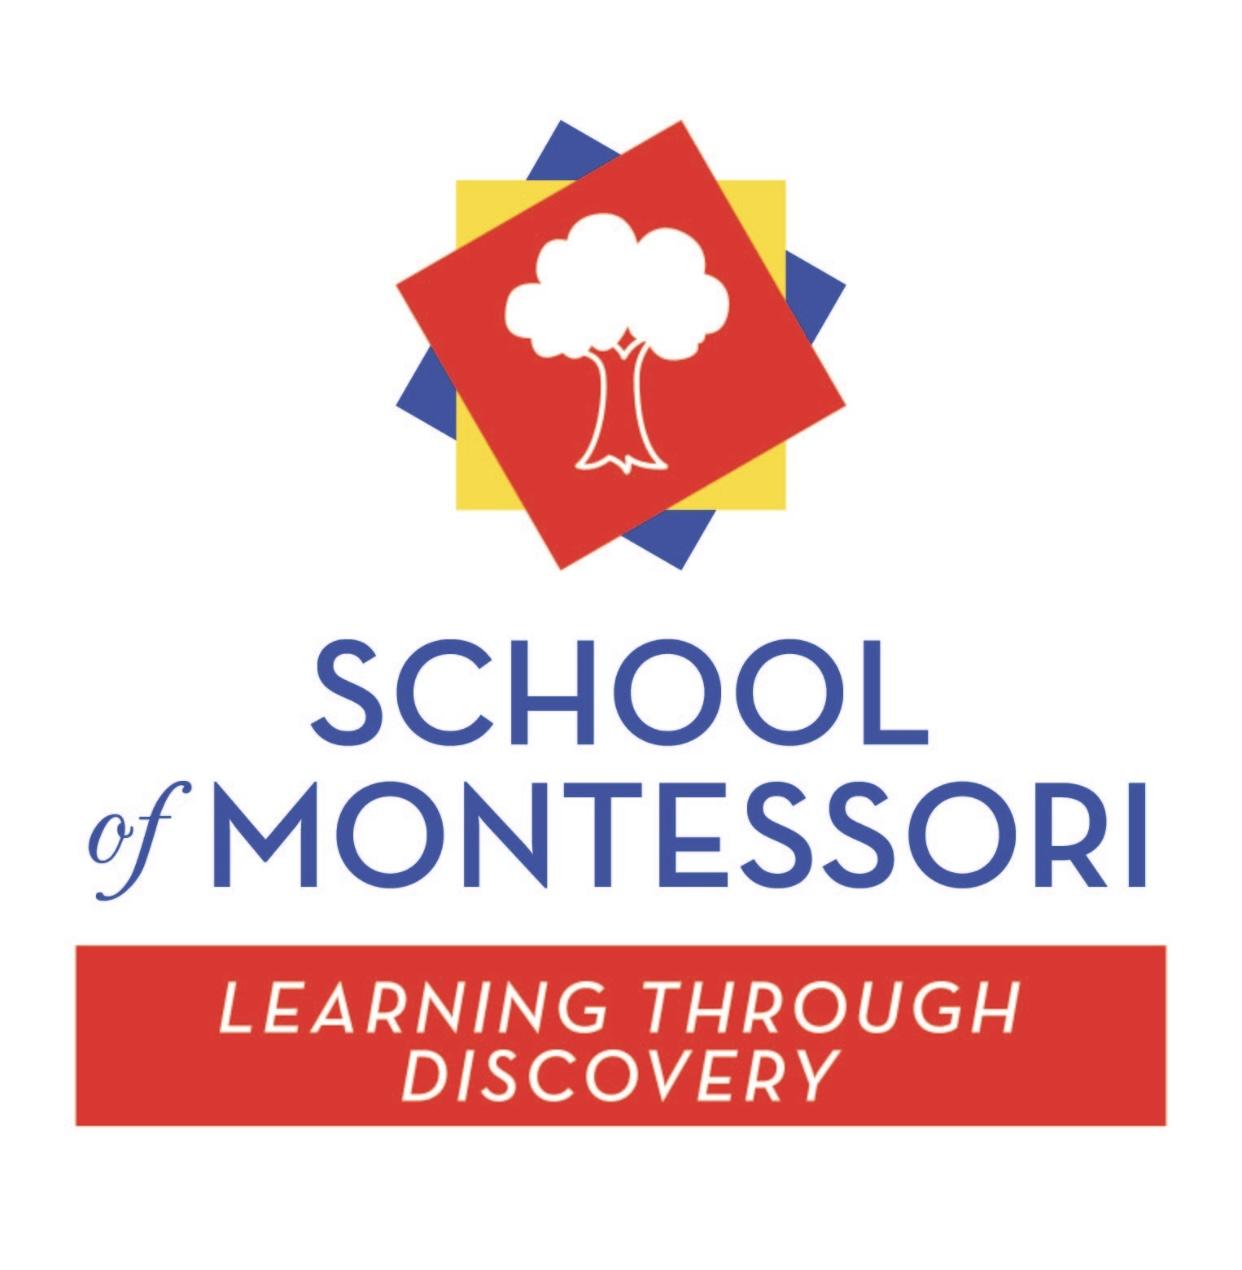 The School of Montessori Inc